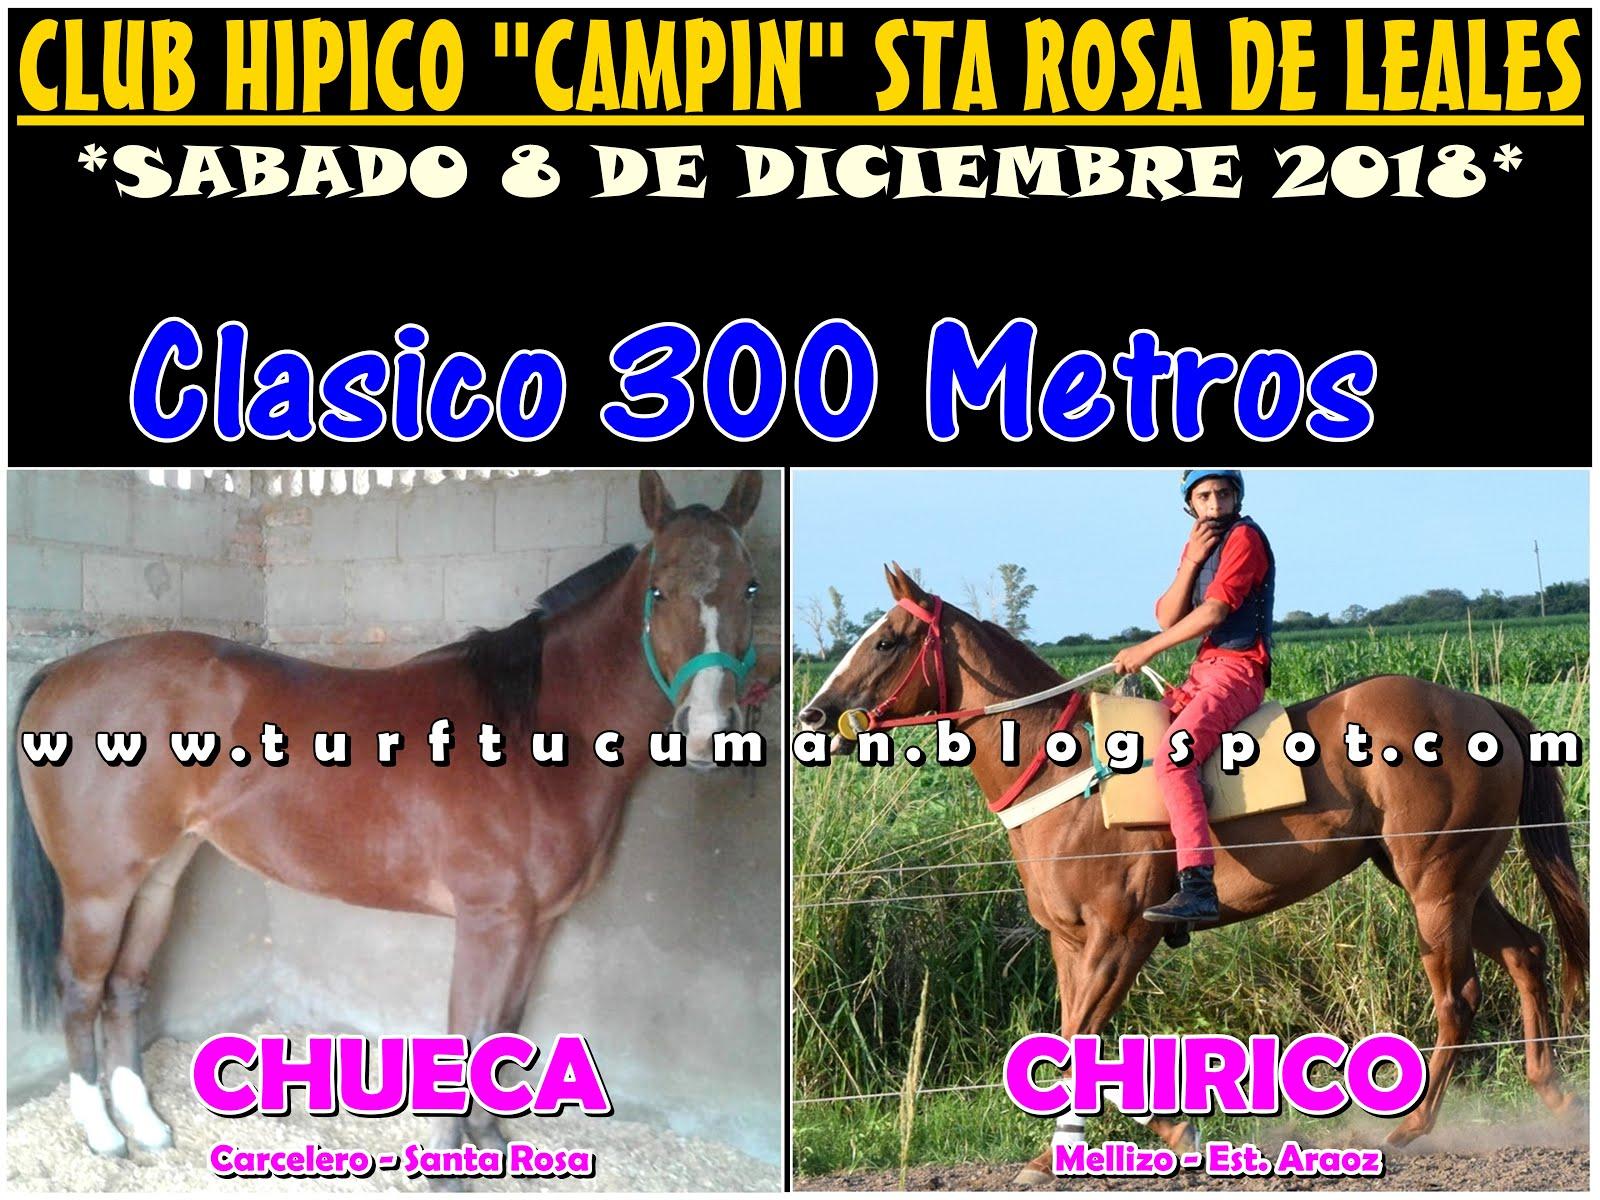 CHUECA VS CHIRICO